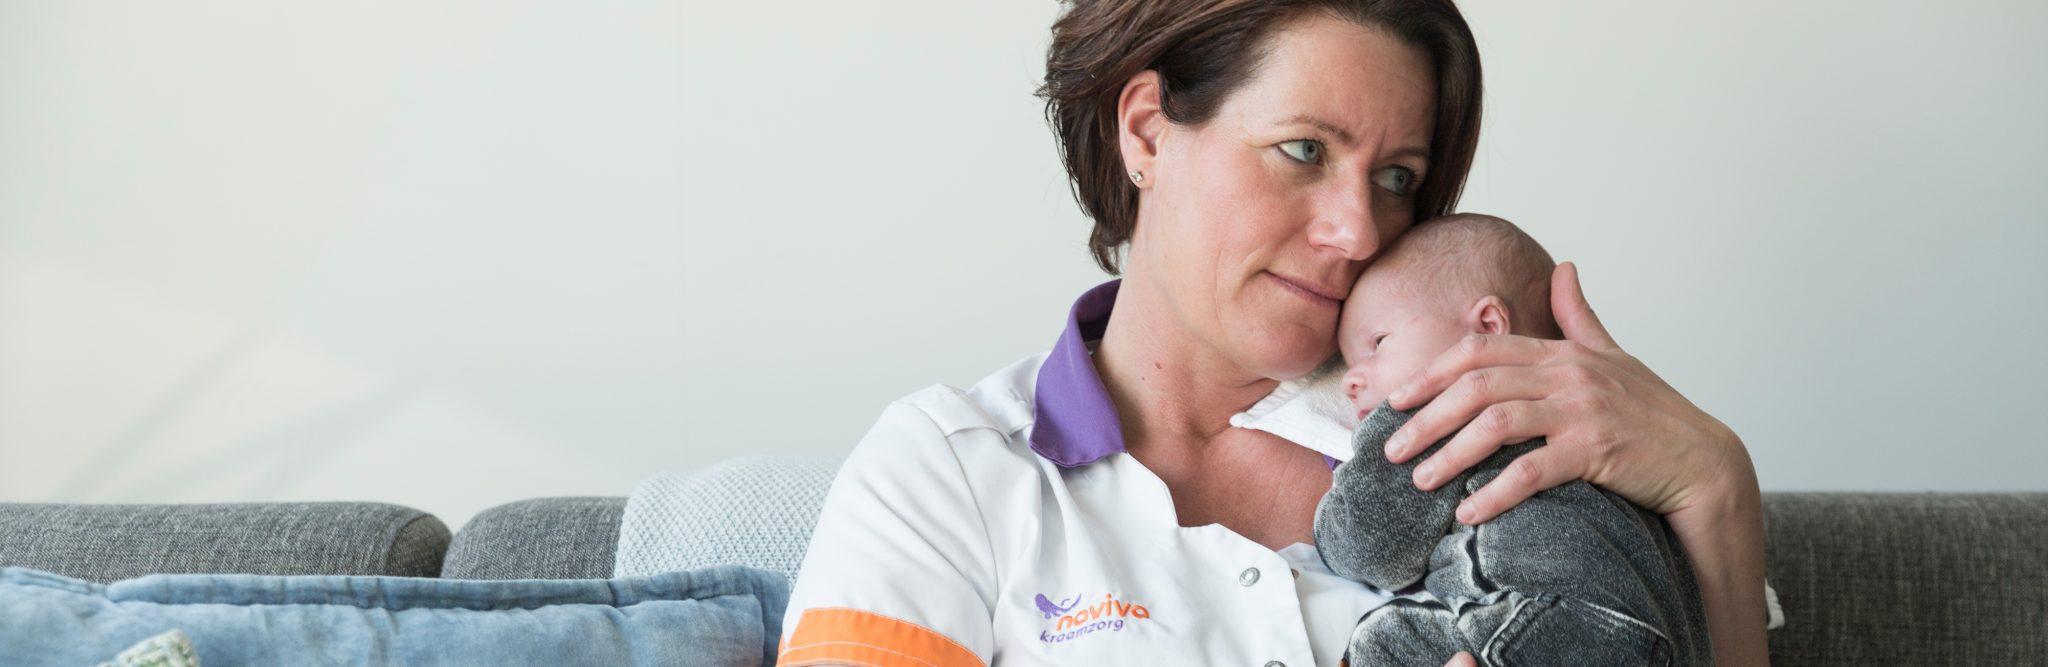 Kraamverzorgende met baby